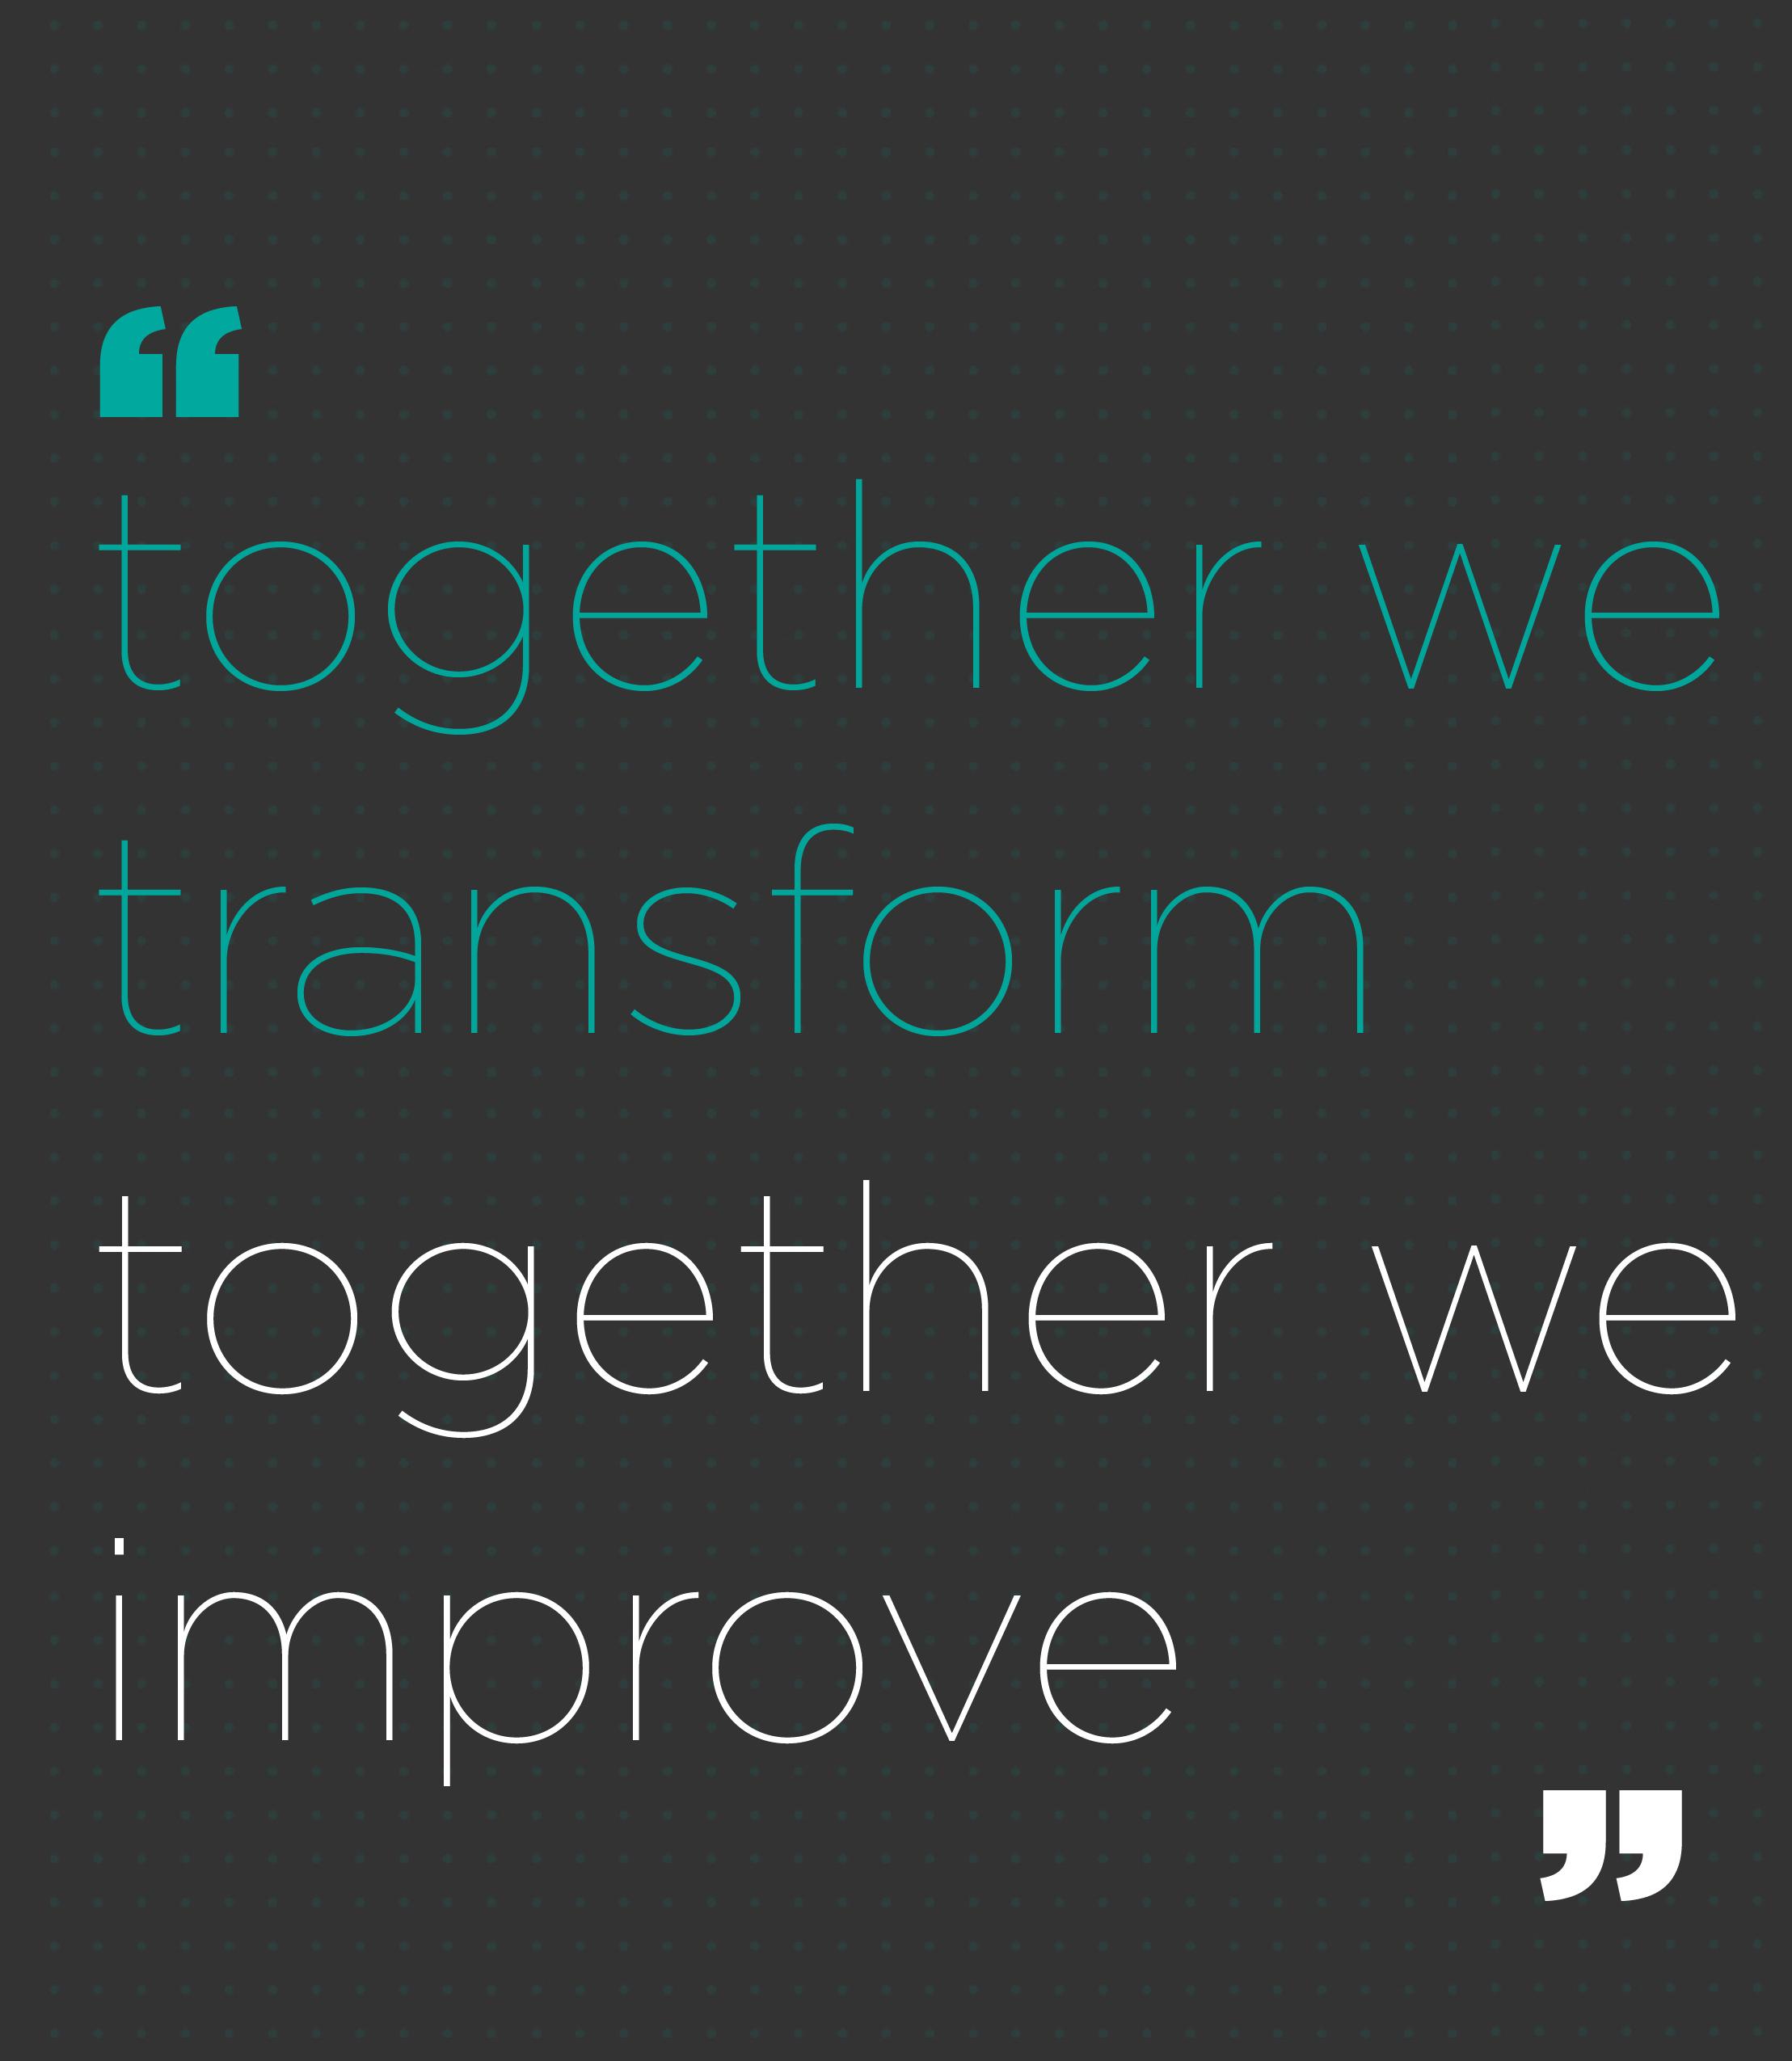 Togheter we transform